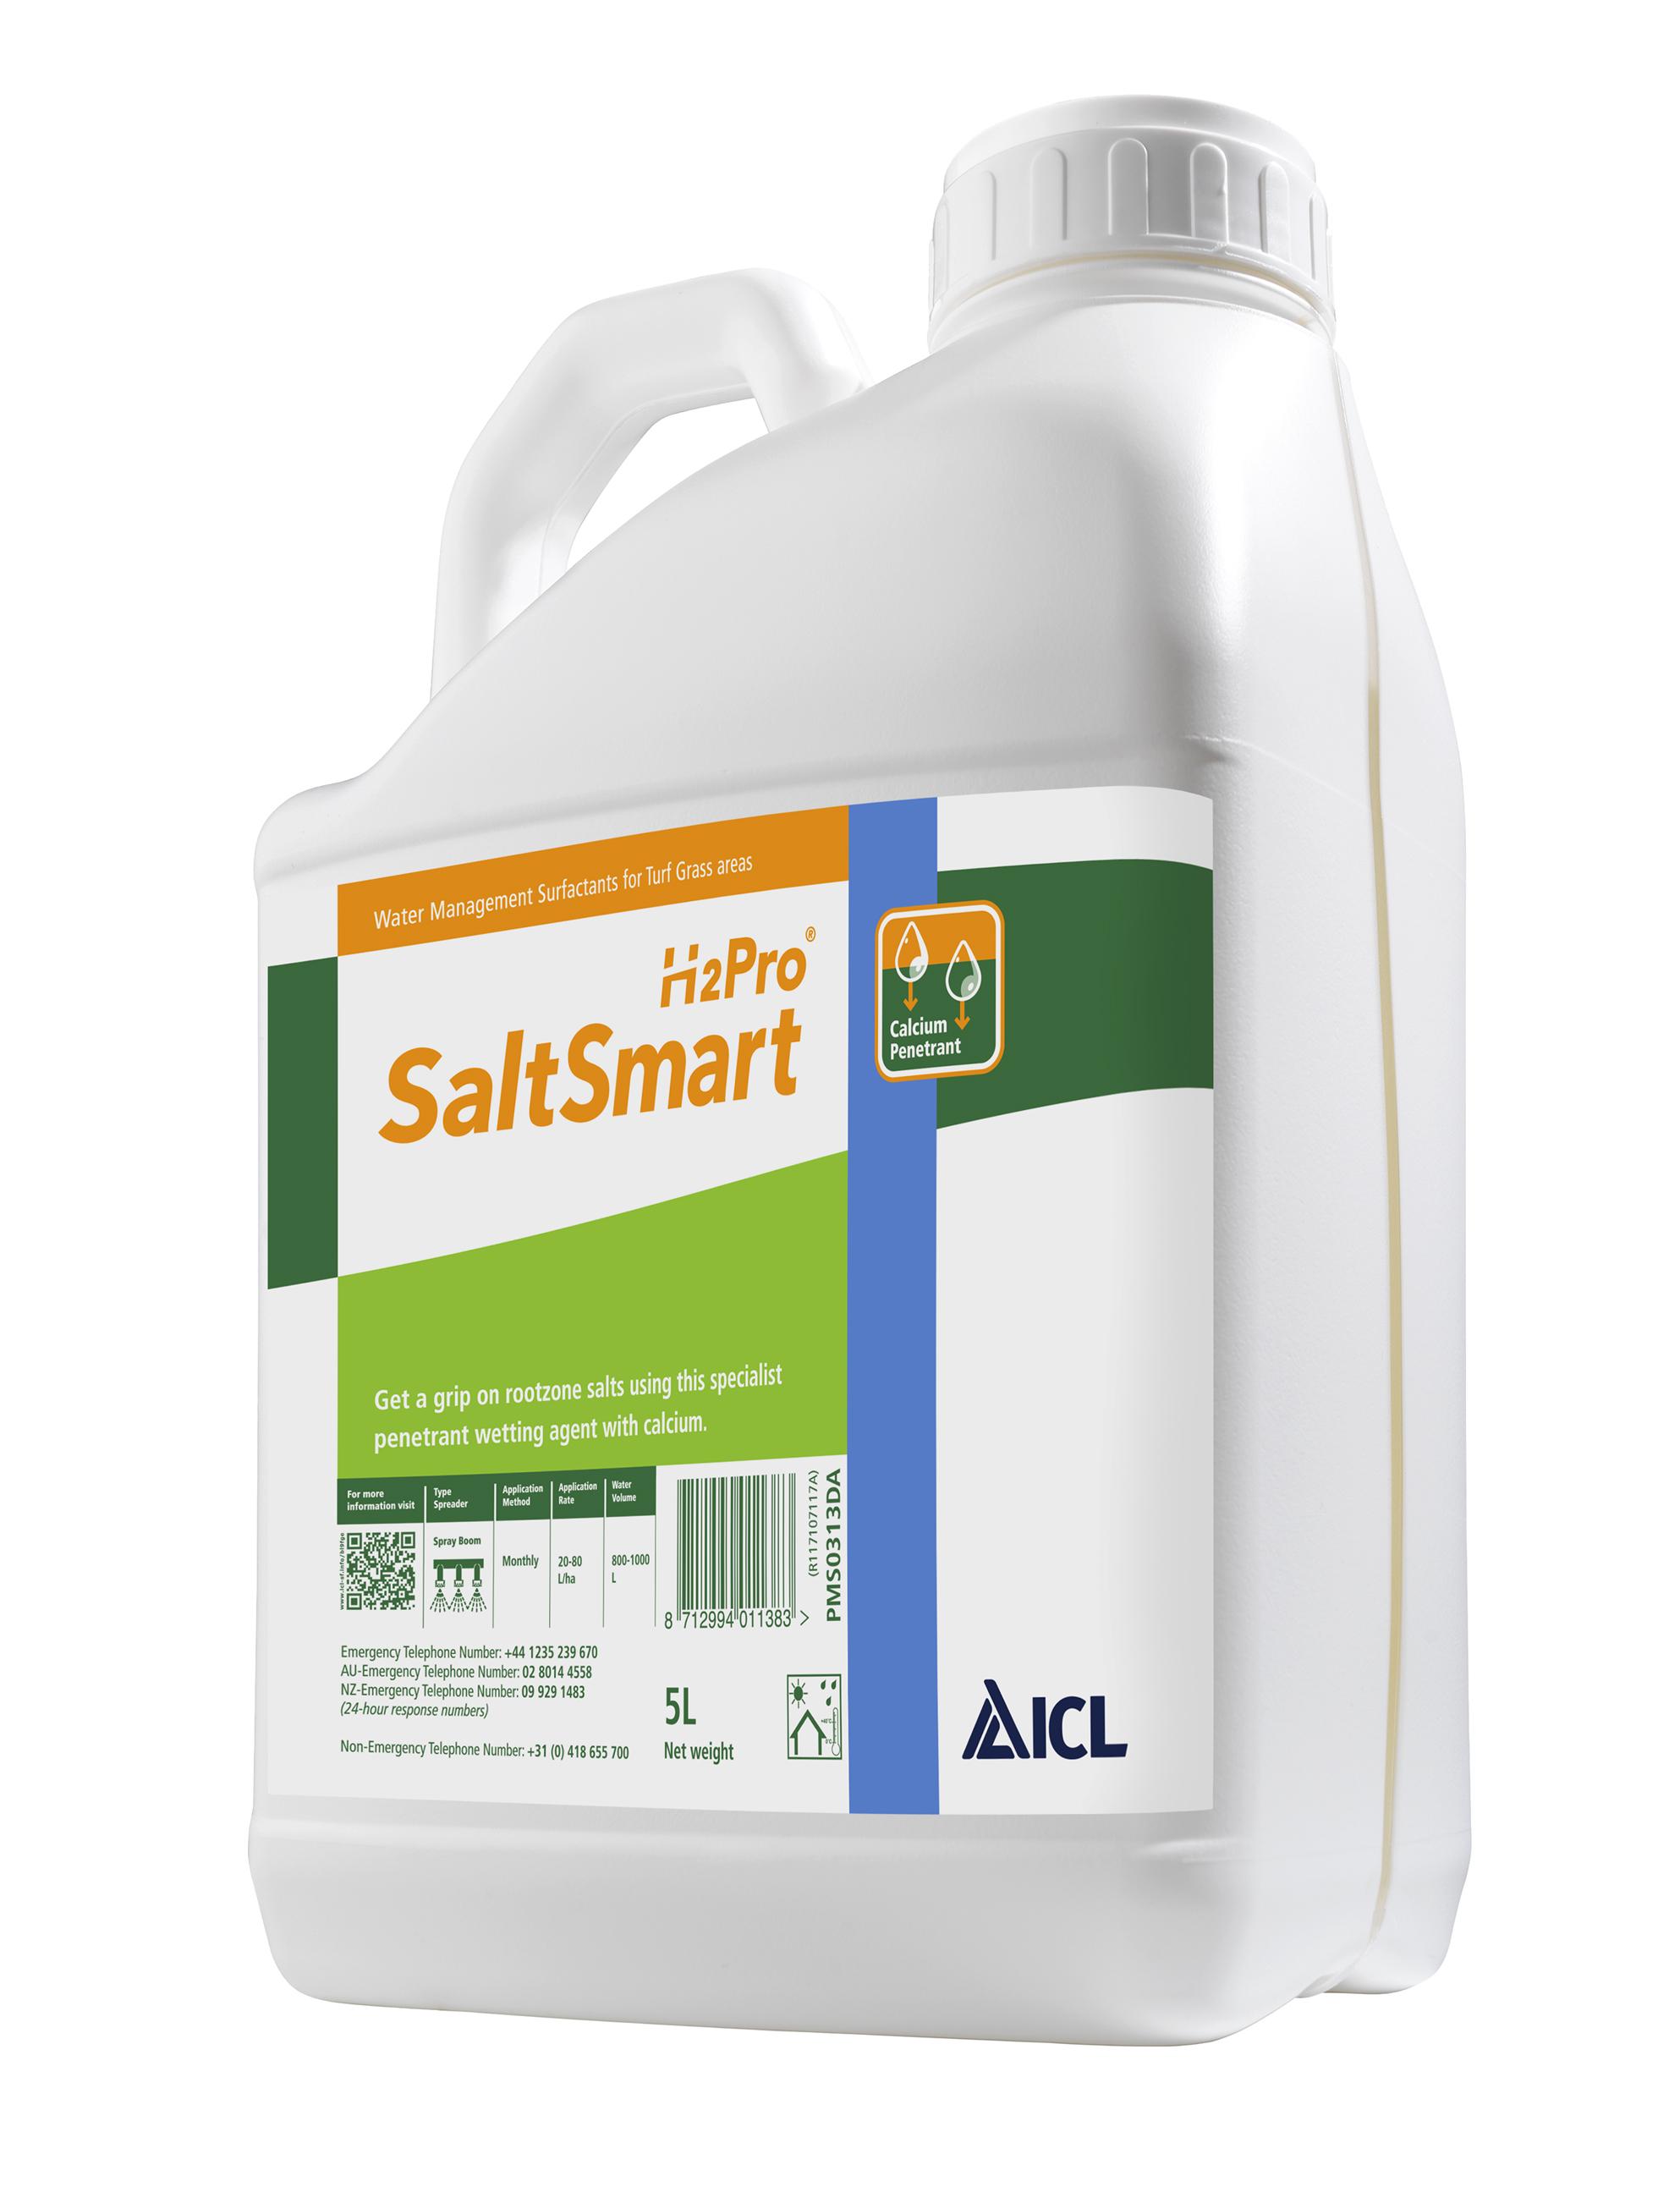 H2Pro H2Pro SaltSmart